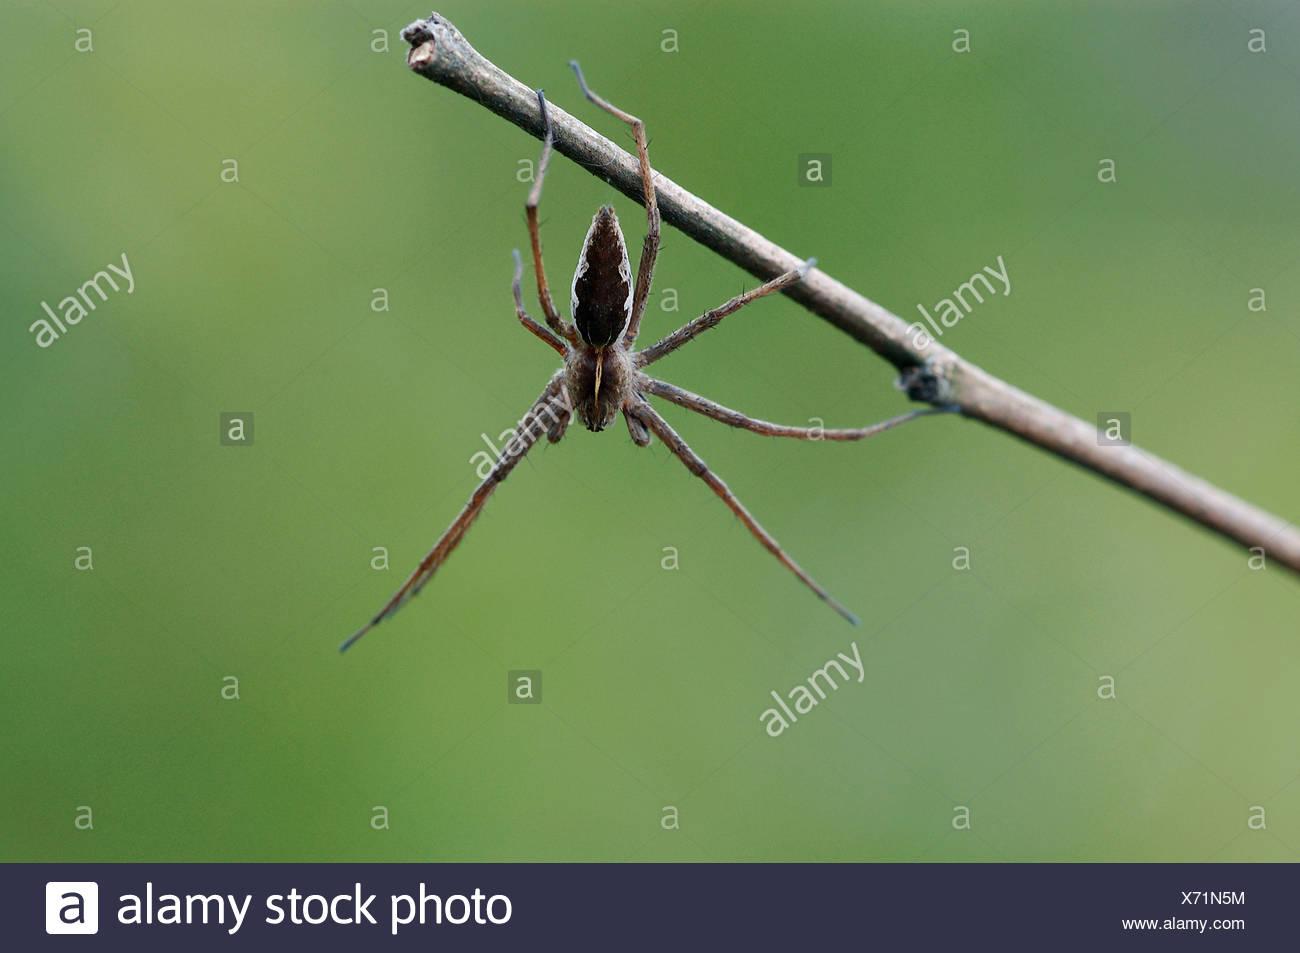 Fantastic Fishing Spider - Stock Image